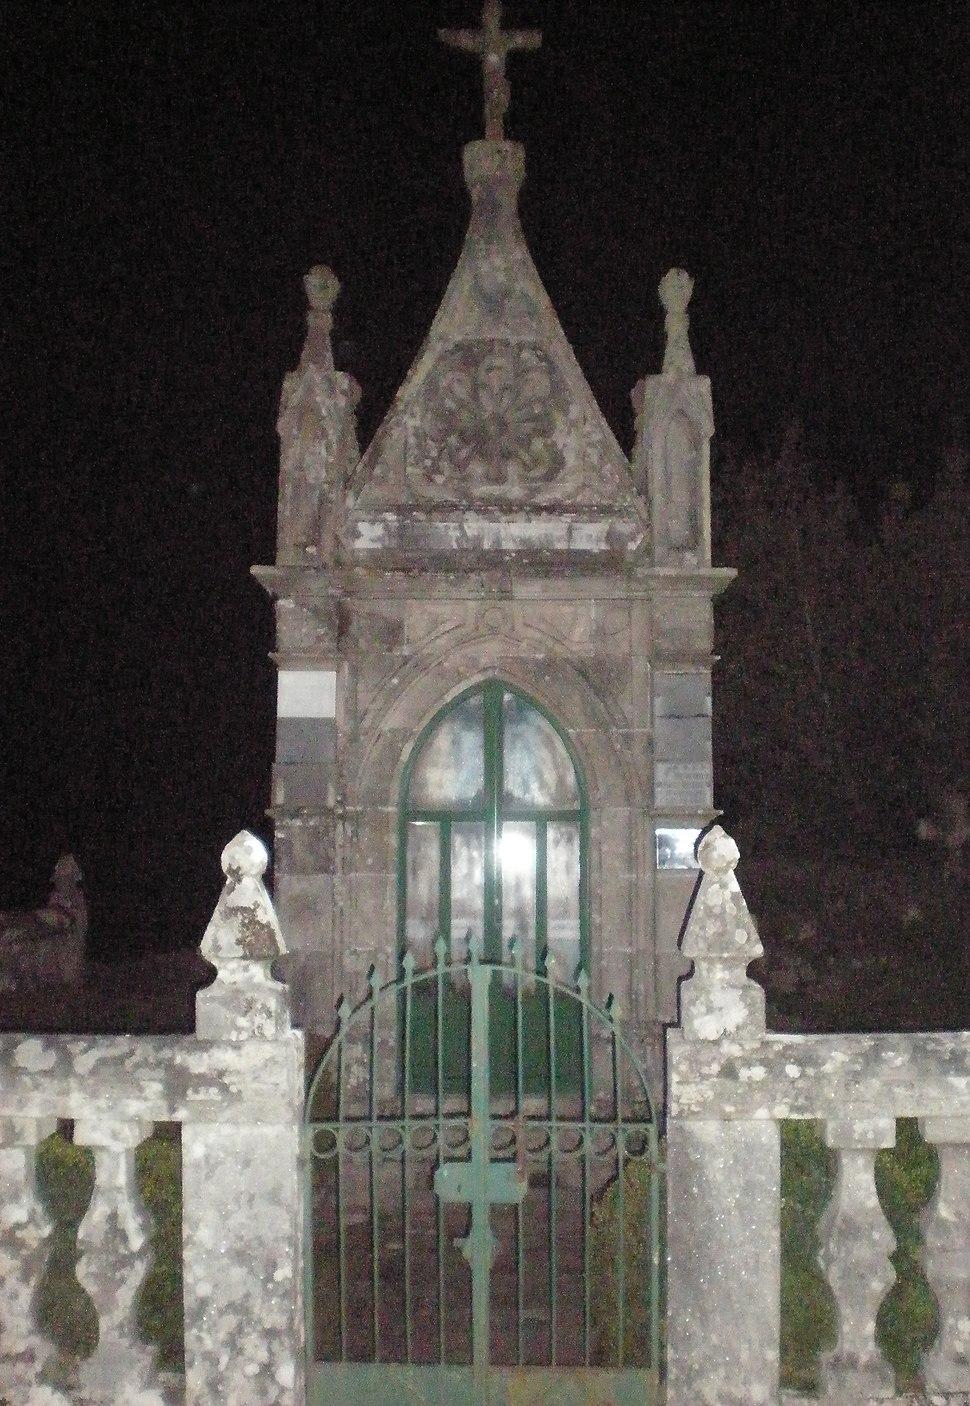 Monumento no cemiterio da Estrada, Galicia (Spain)